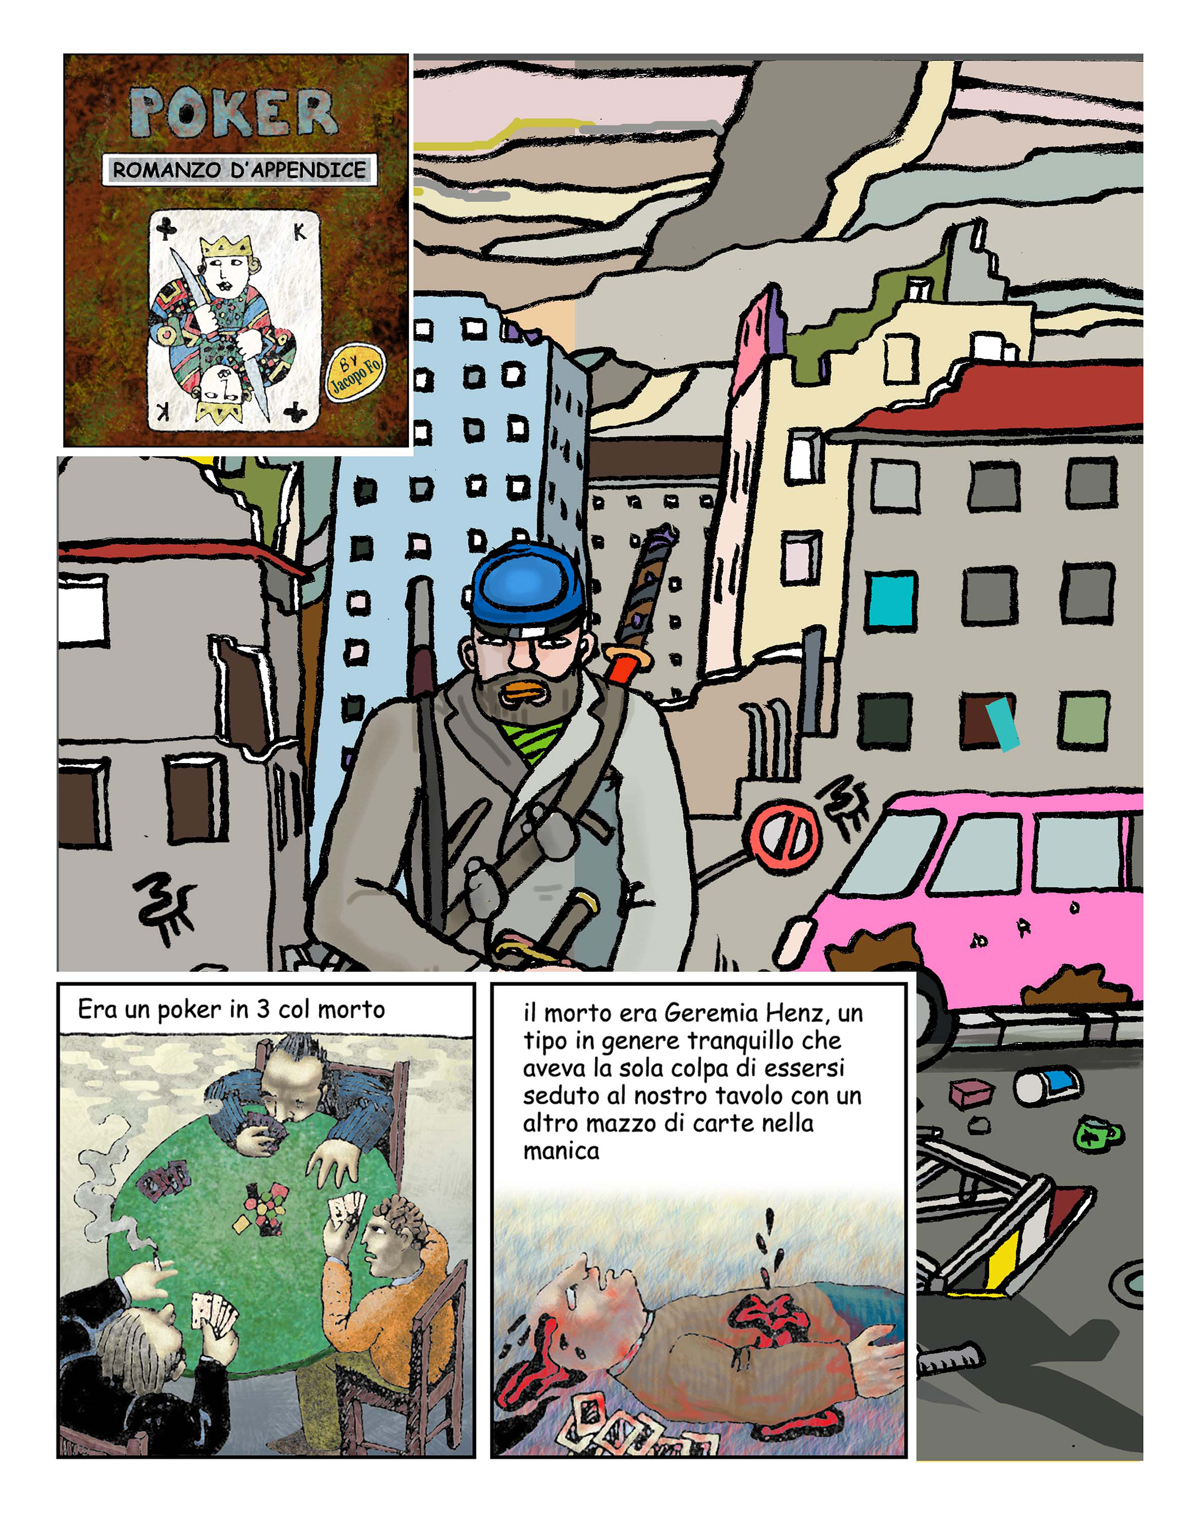 Fumetti di Jacopo Fo Poker